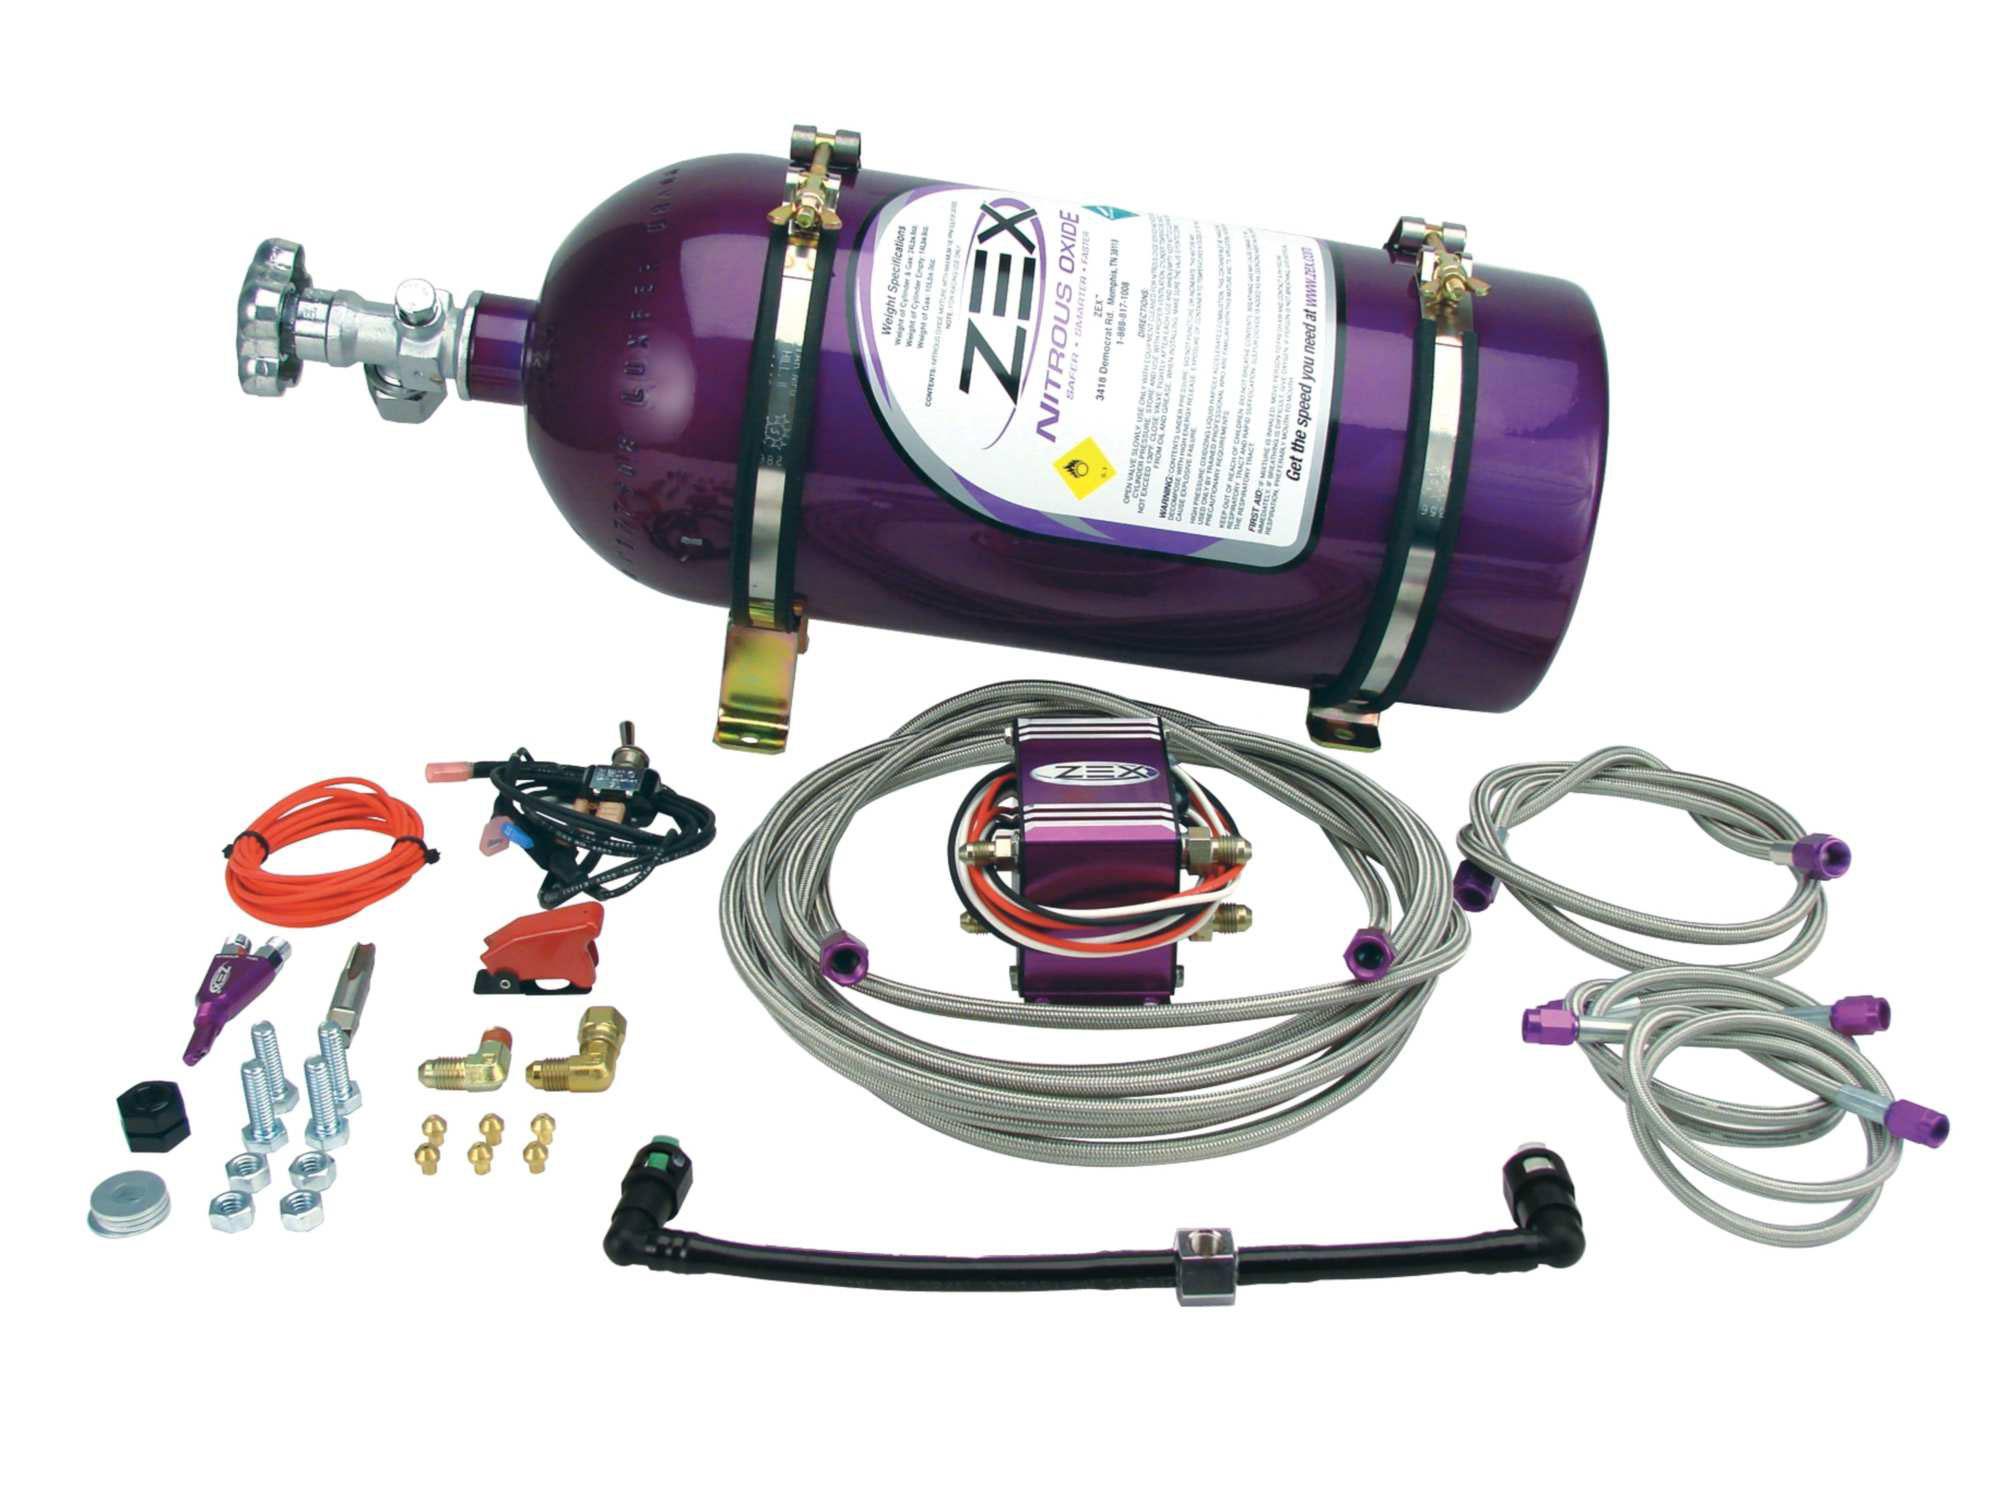 Zex 82177 - Zex EFI Wet Nitrous System - Charger / Magnum 5.7L HEMI 75-125HP